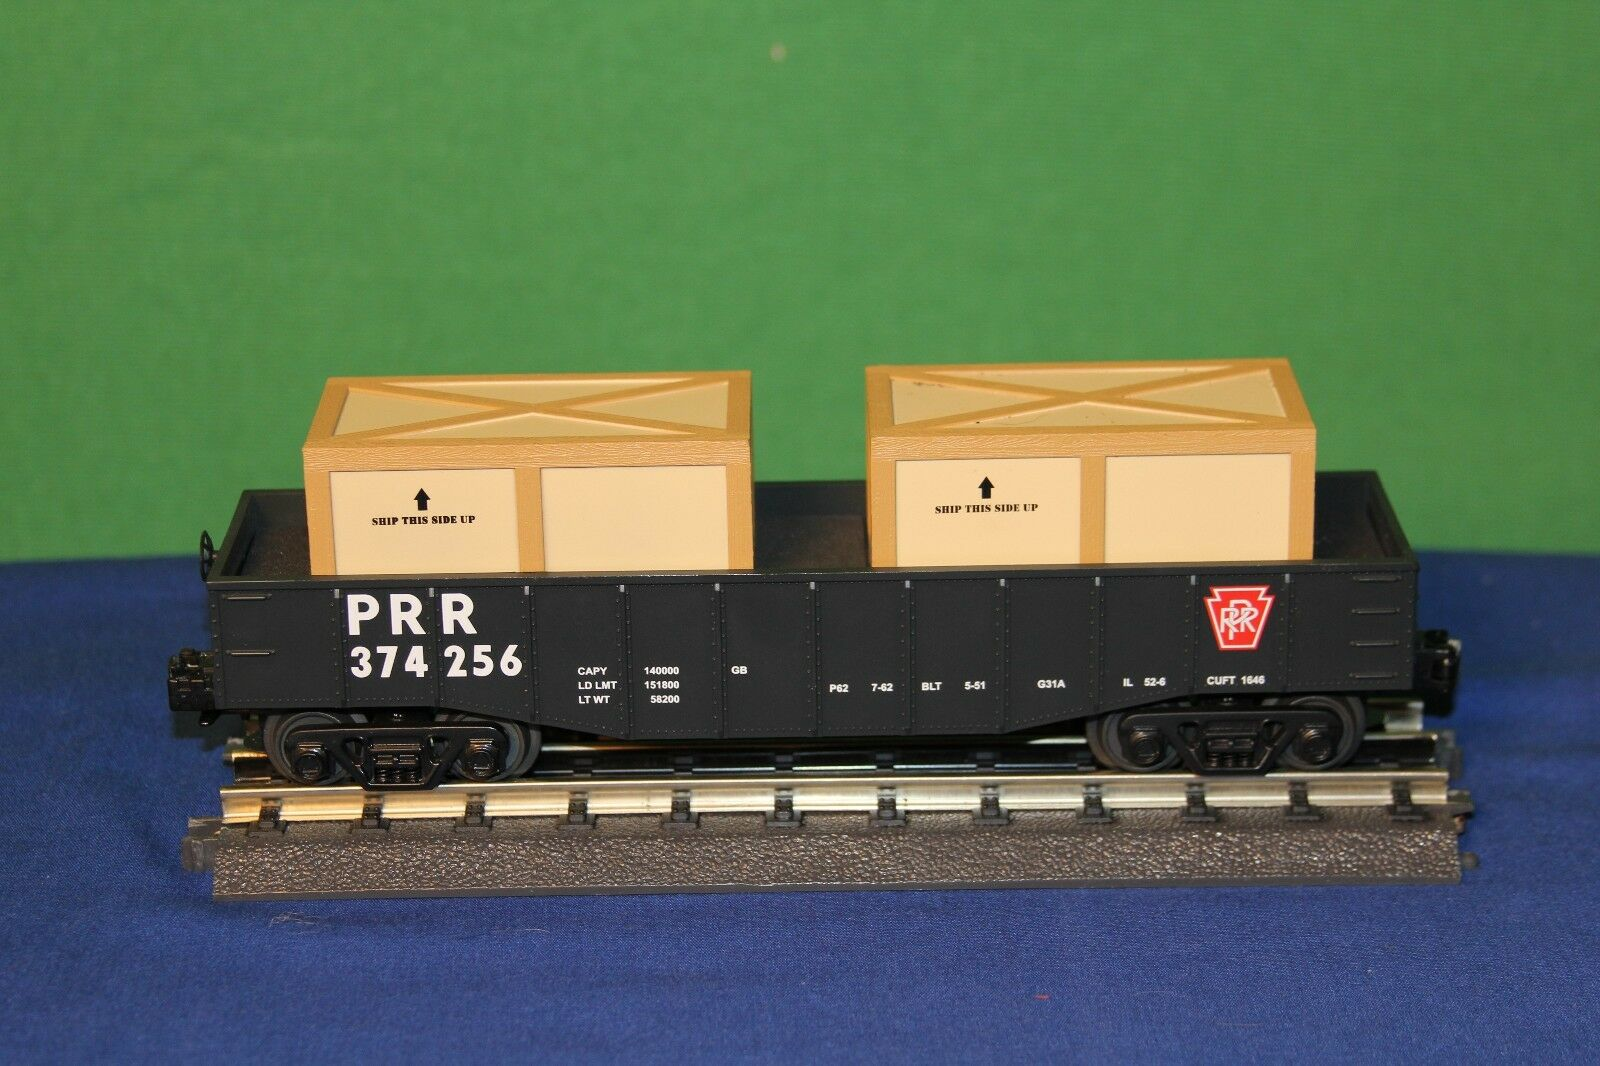 compra en línea hoy MTH rail king o-calibre Pennsylvania (repetición) góndola W    374256 de dos cajas extraíble  precios ultra bajos